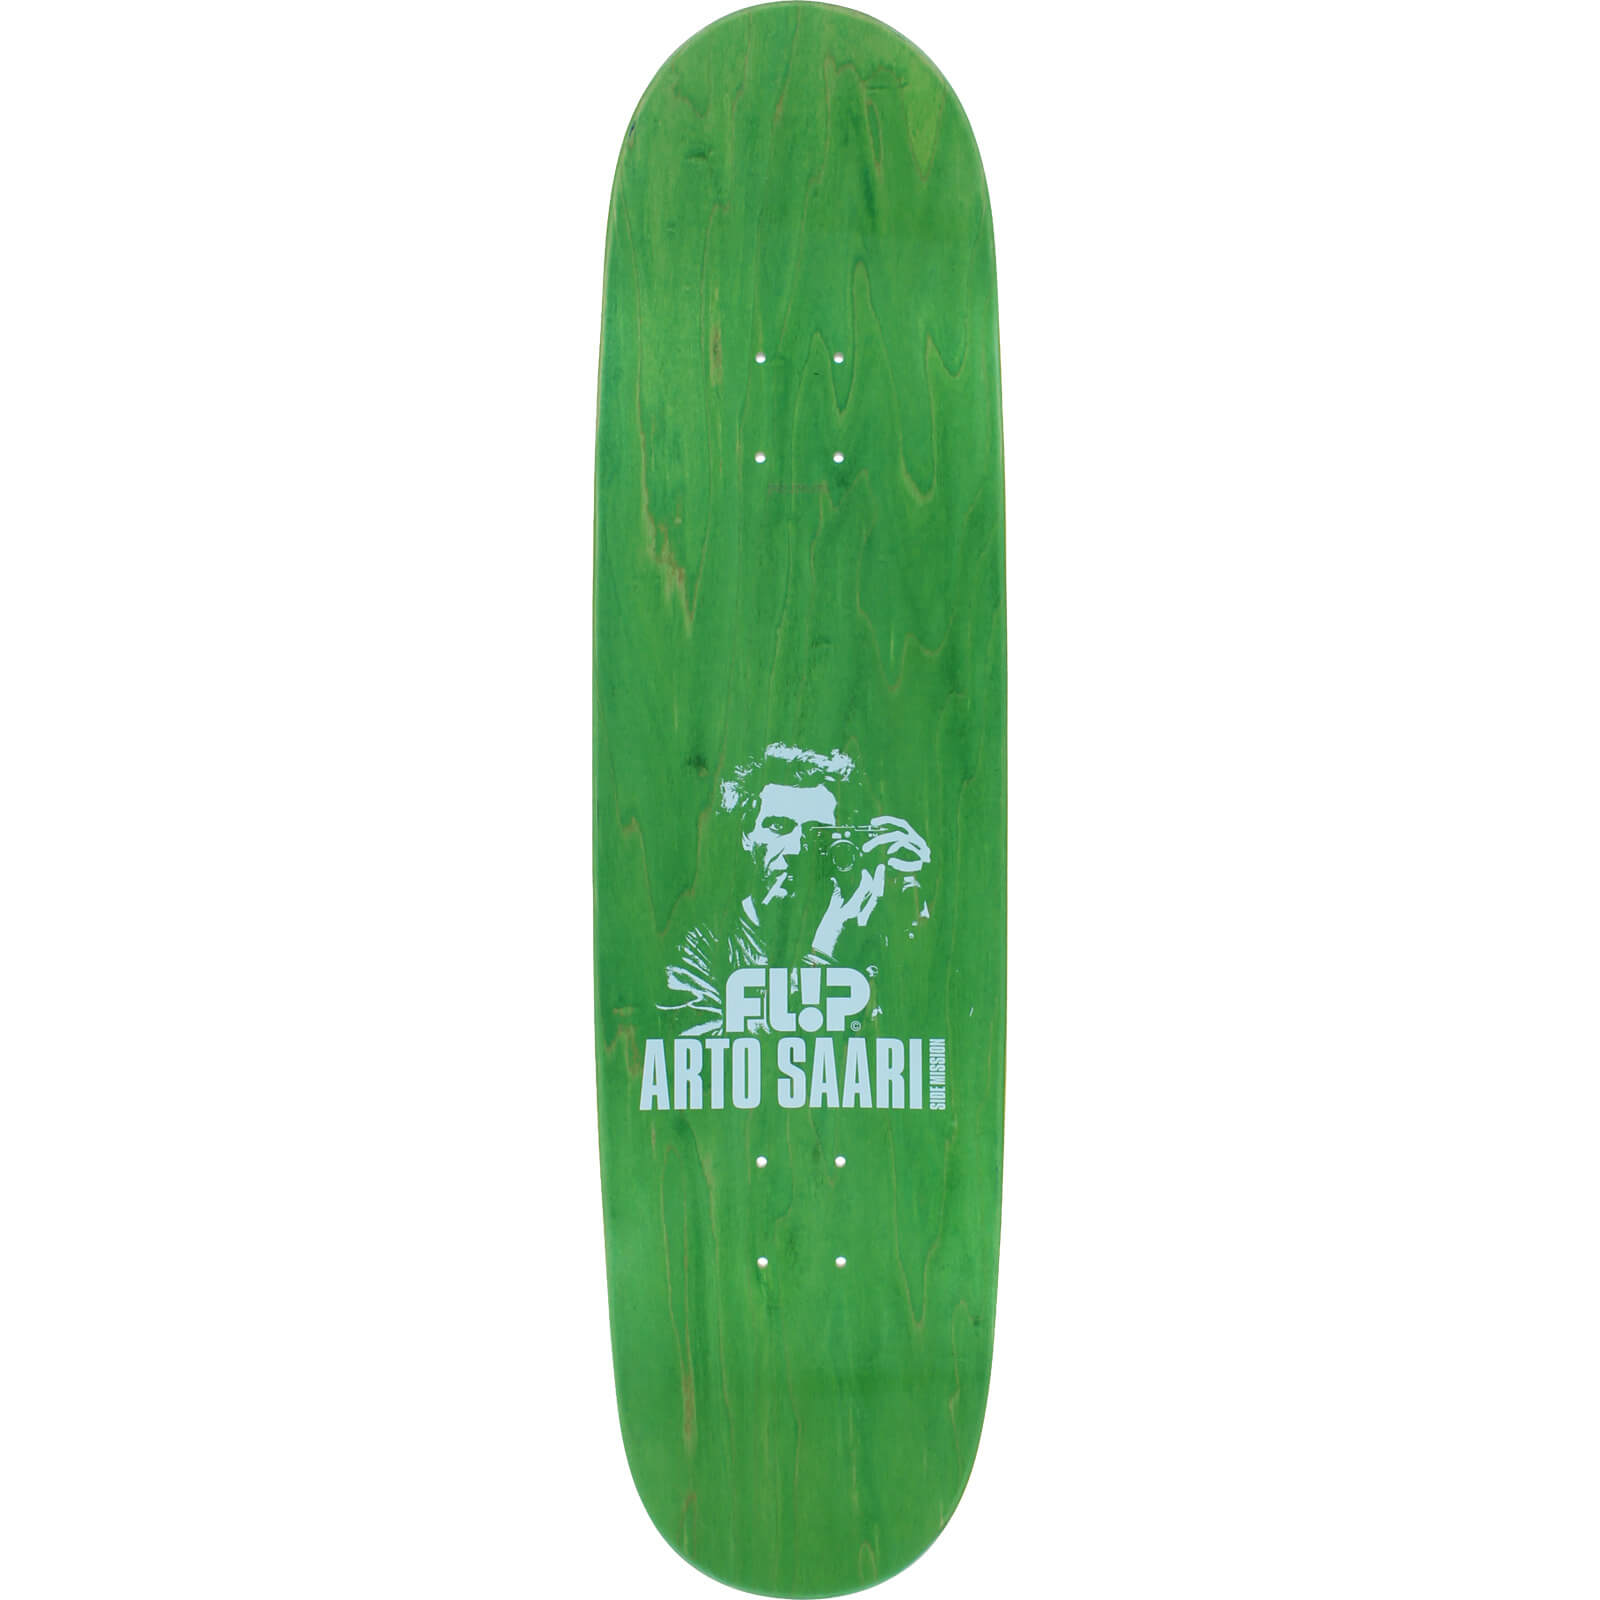 Flip Skateboards Arto Saari Side Mission Skateboard Deck